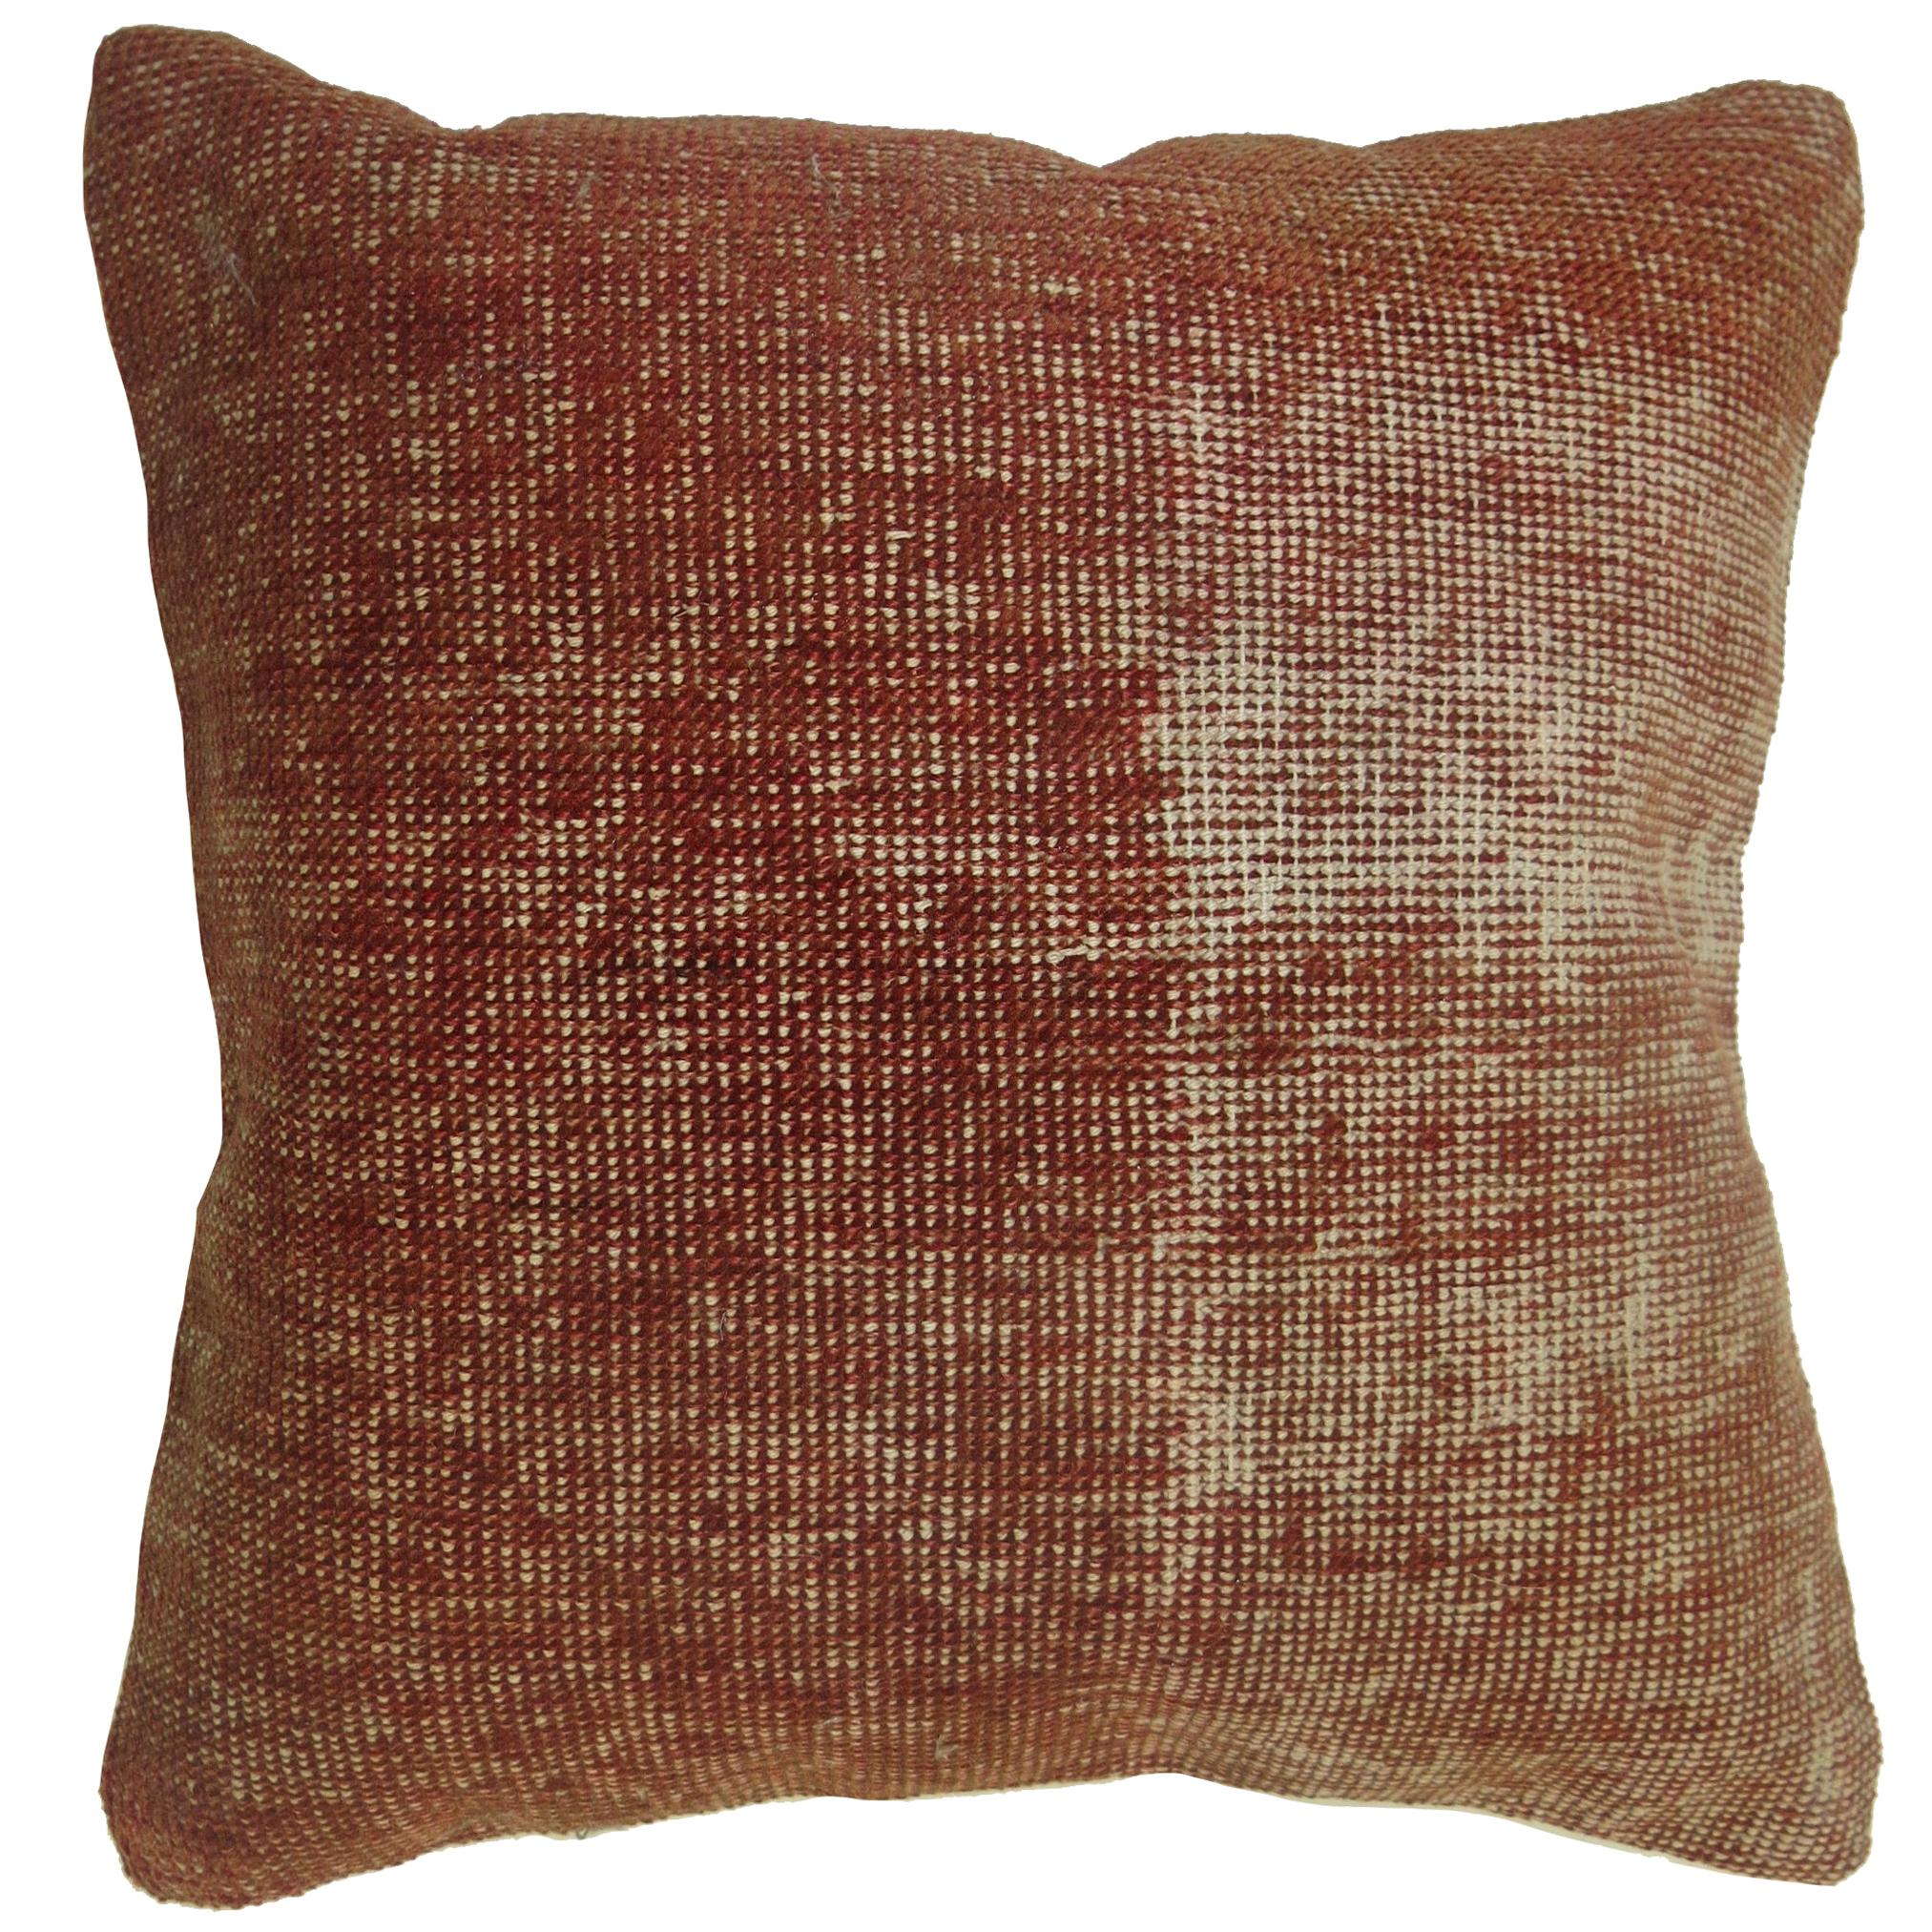 Burnt Orange Solid Turkish Distressed Rug Pillow